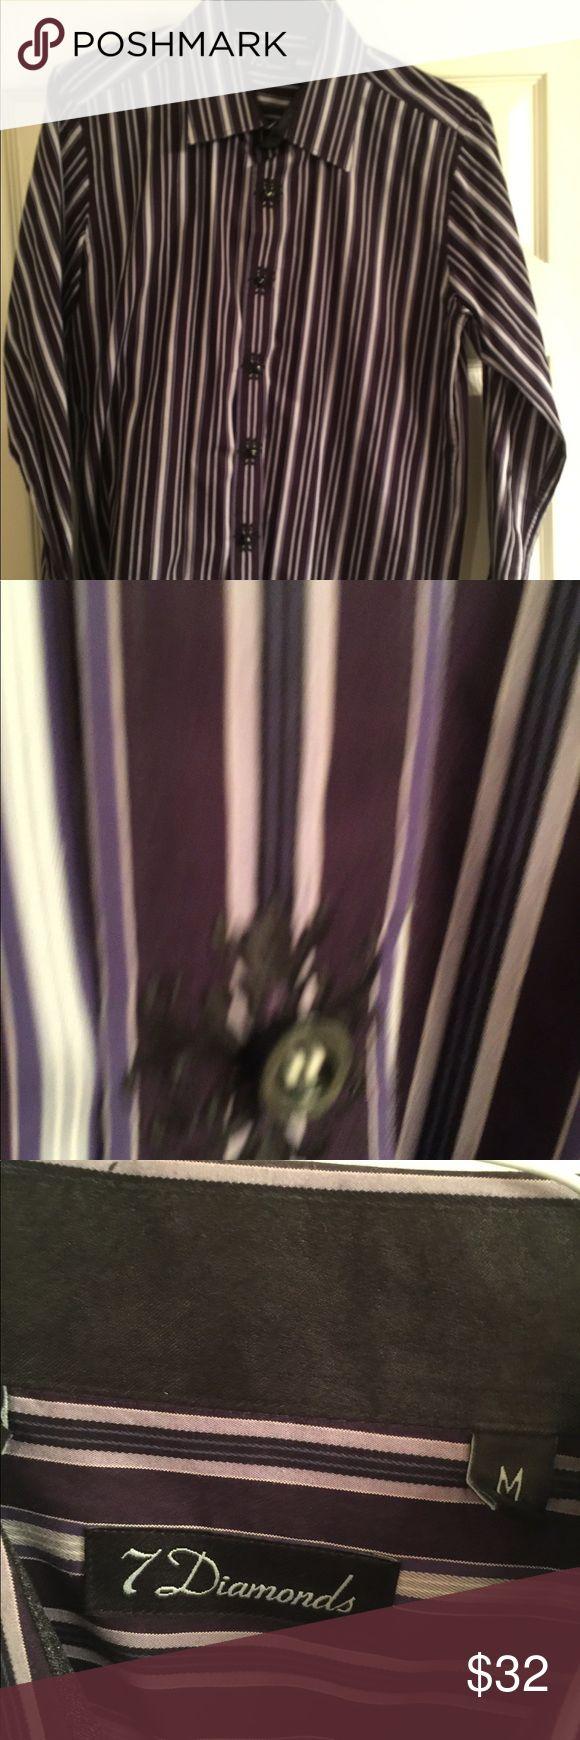 Men's 7 Diamonds Dress Shirt Men's medium 7 Diamonds dress shirt.  Deep purple with multi color stripes of blue grey yellow.  Detail accent on the buttons. 7 Diamonds Shirts Dress Shirts